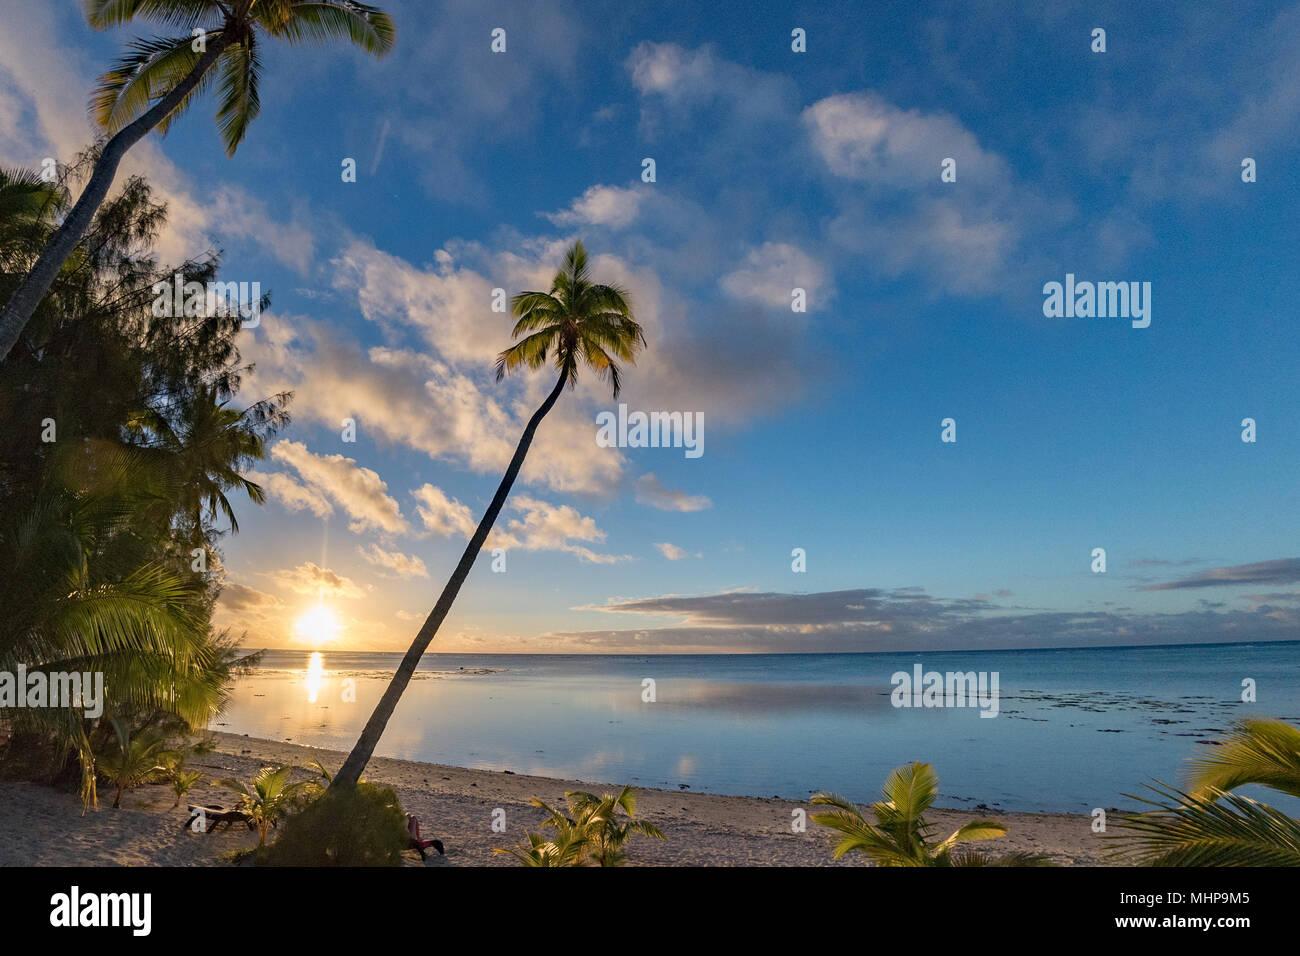 Aitutaki Island Polynesien Strand Wunderschöne rote Sonnenuntergang in Cook Inseln Stockbild